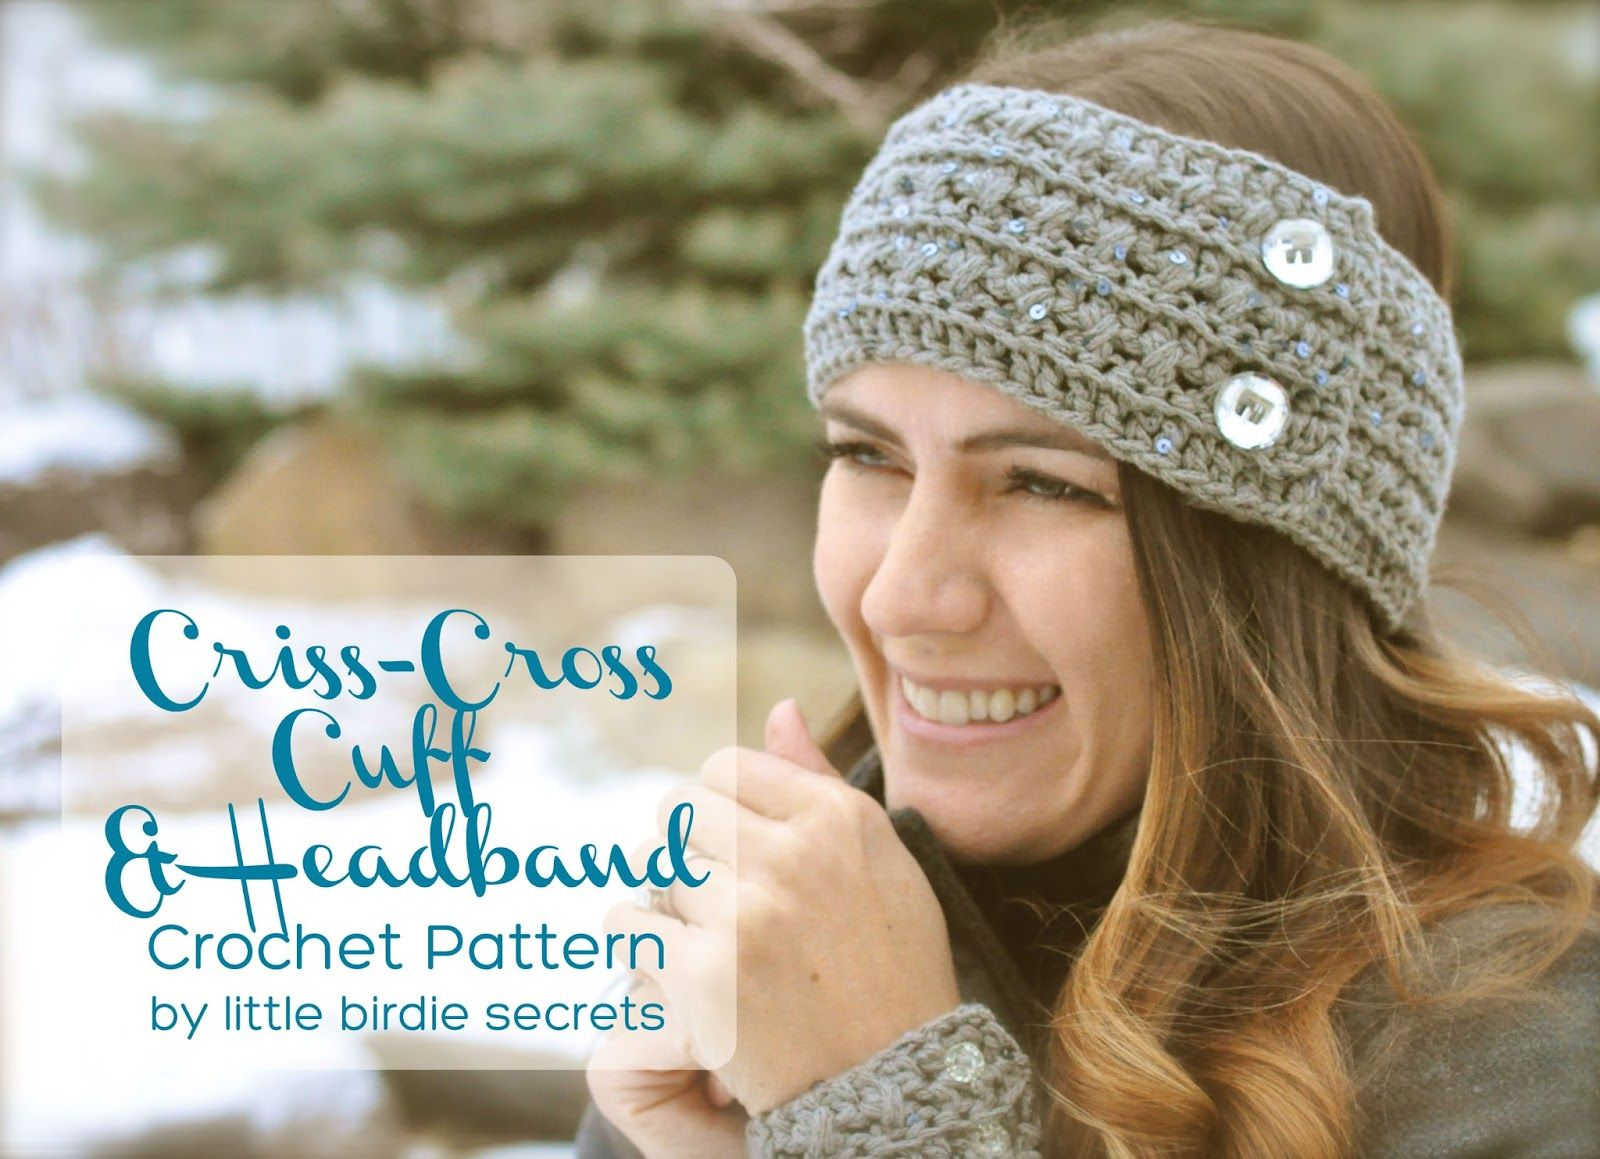 25 Fabulous Free Crochet Accessories - | Crocheted headbands, Free ...